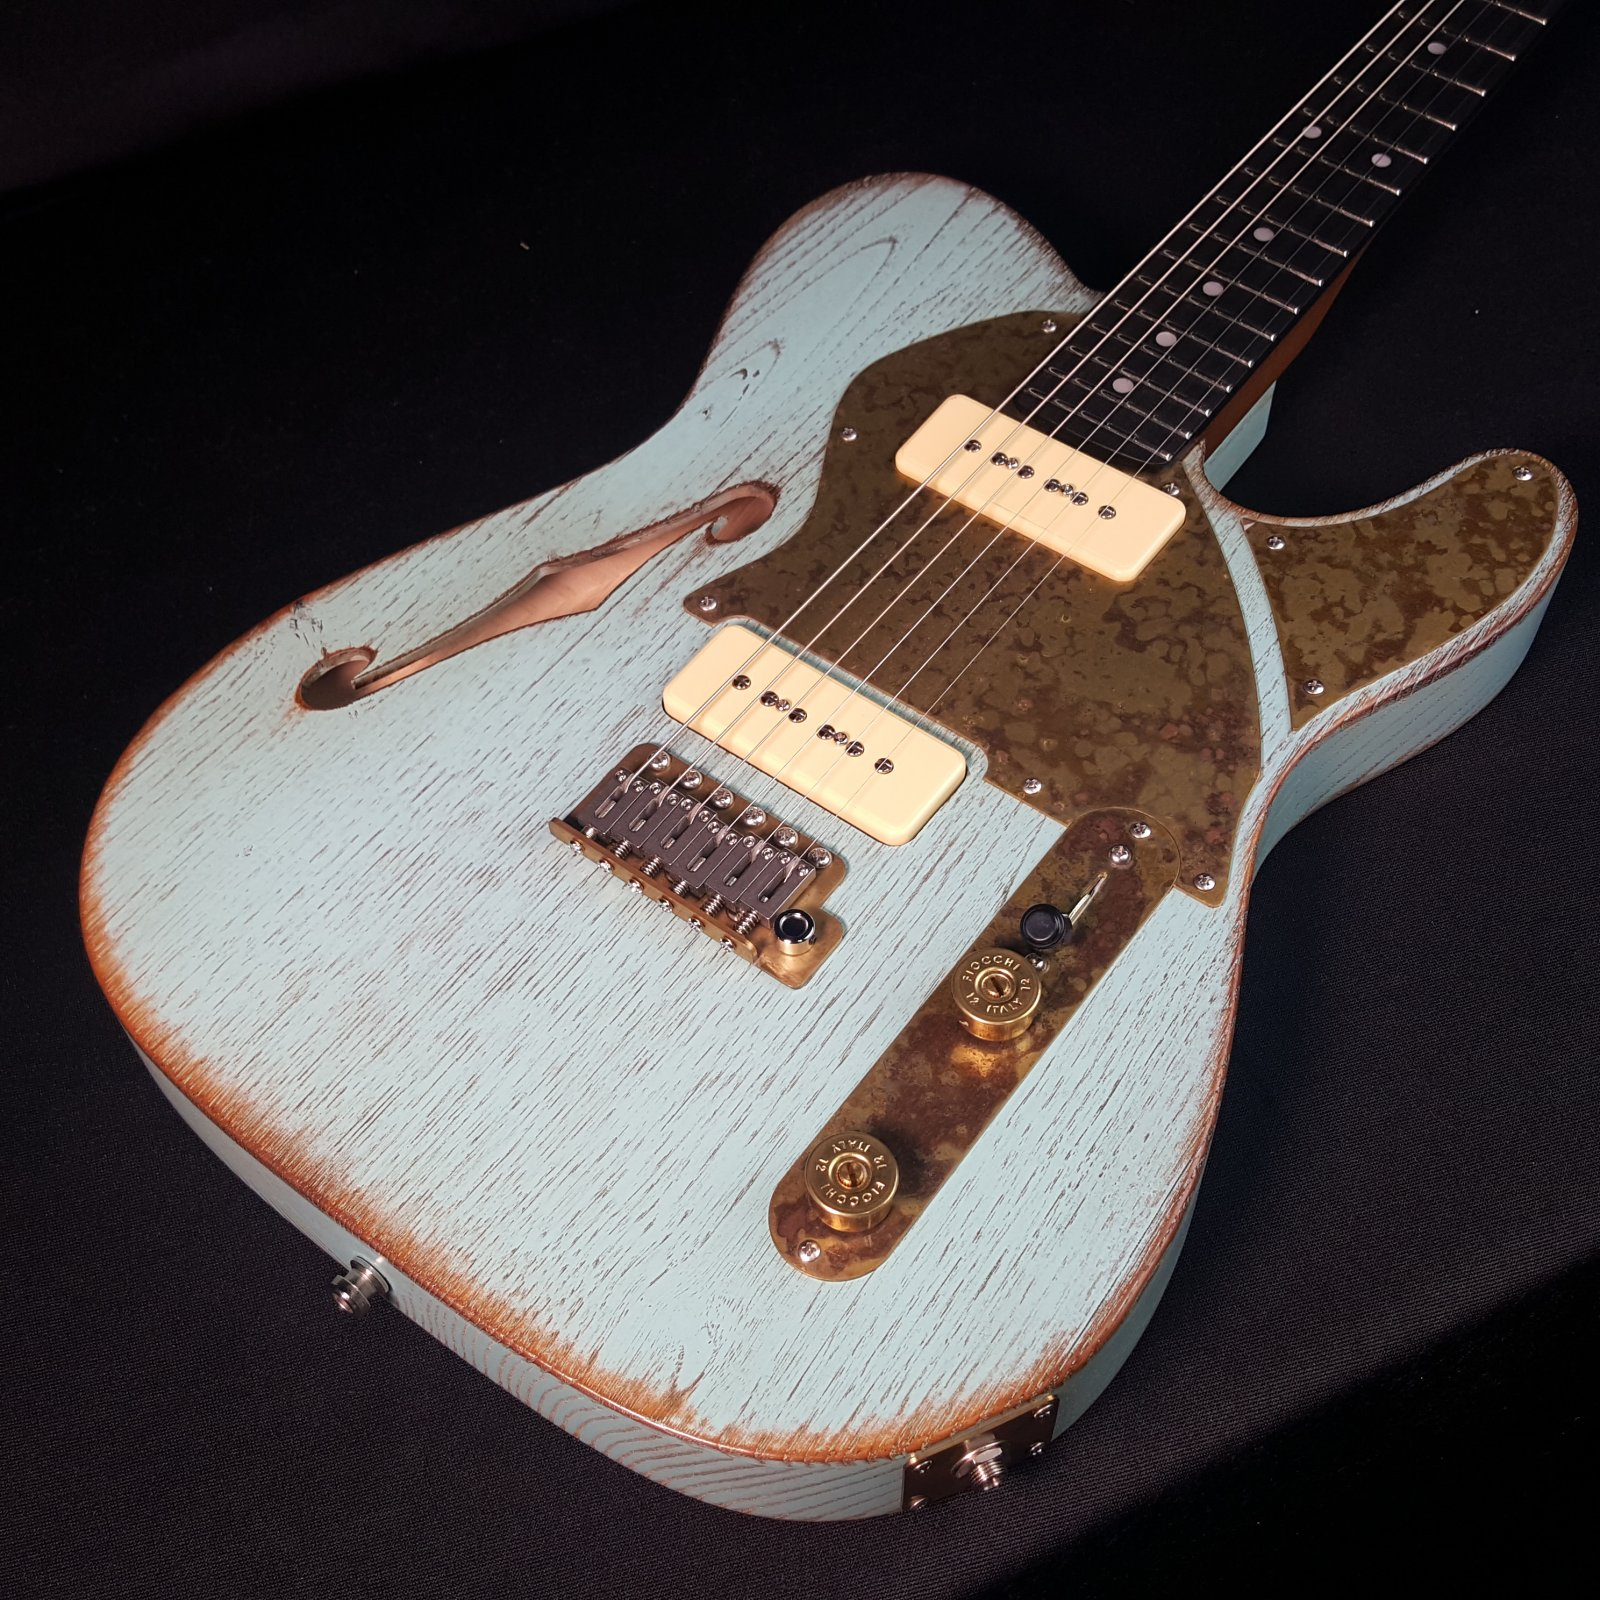 Paoletti Lounge Series 2P90 Nancy Electric Guitar Surf Color w/Hard Case